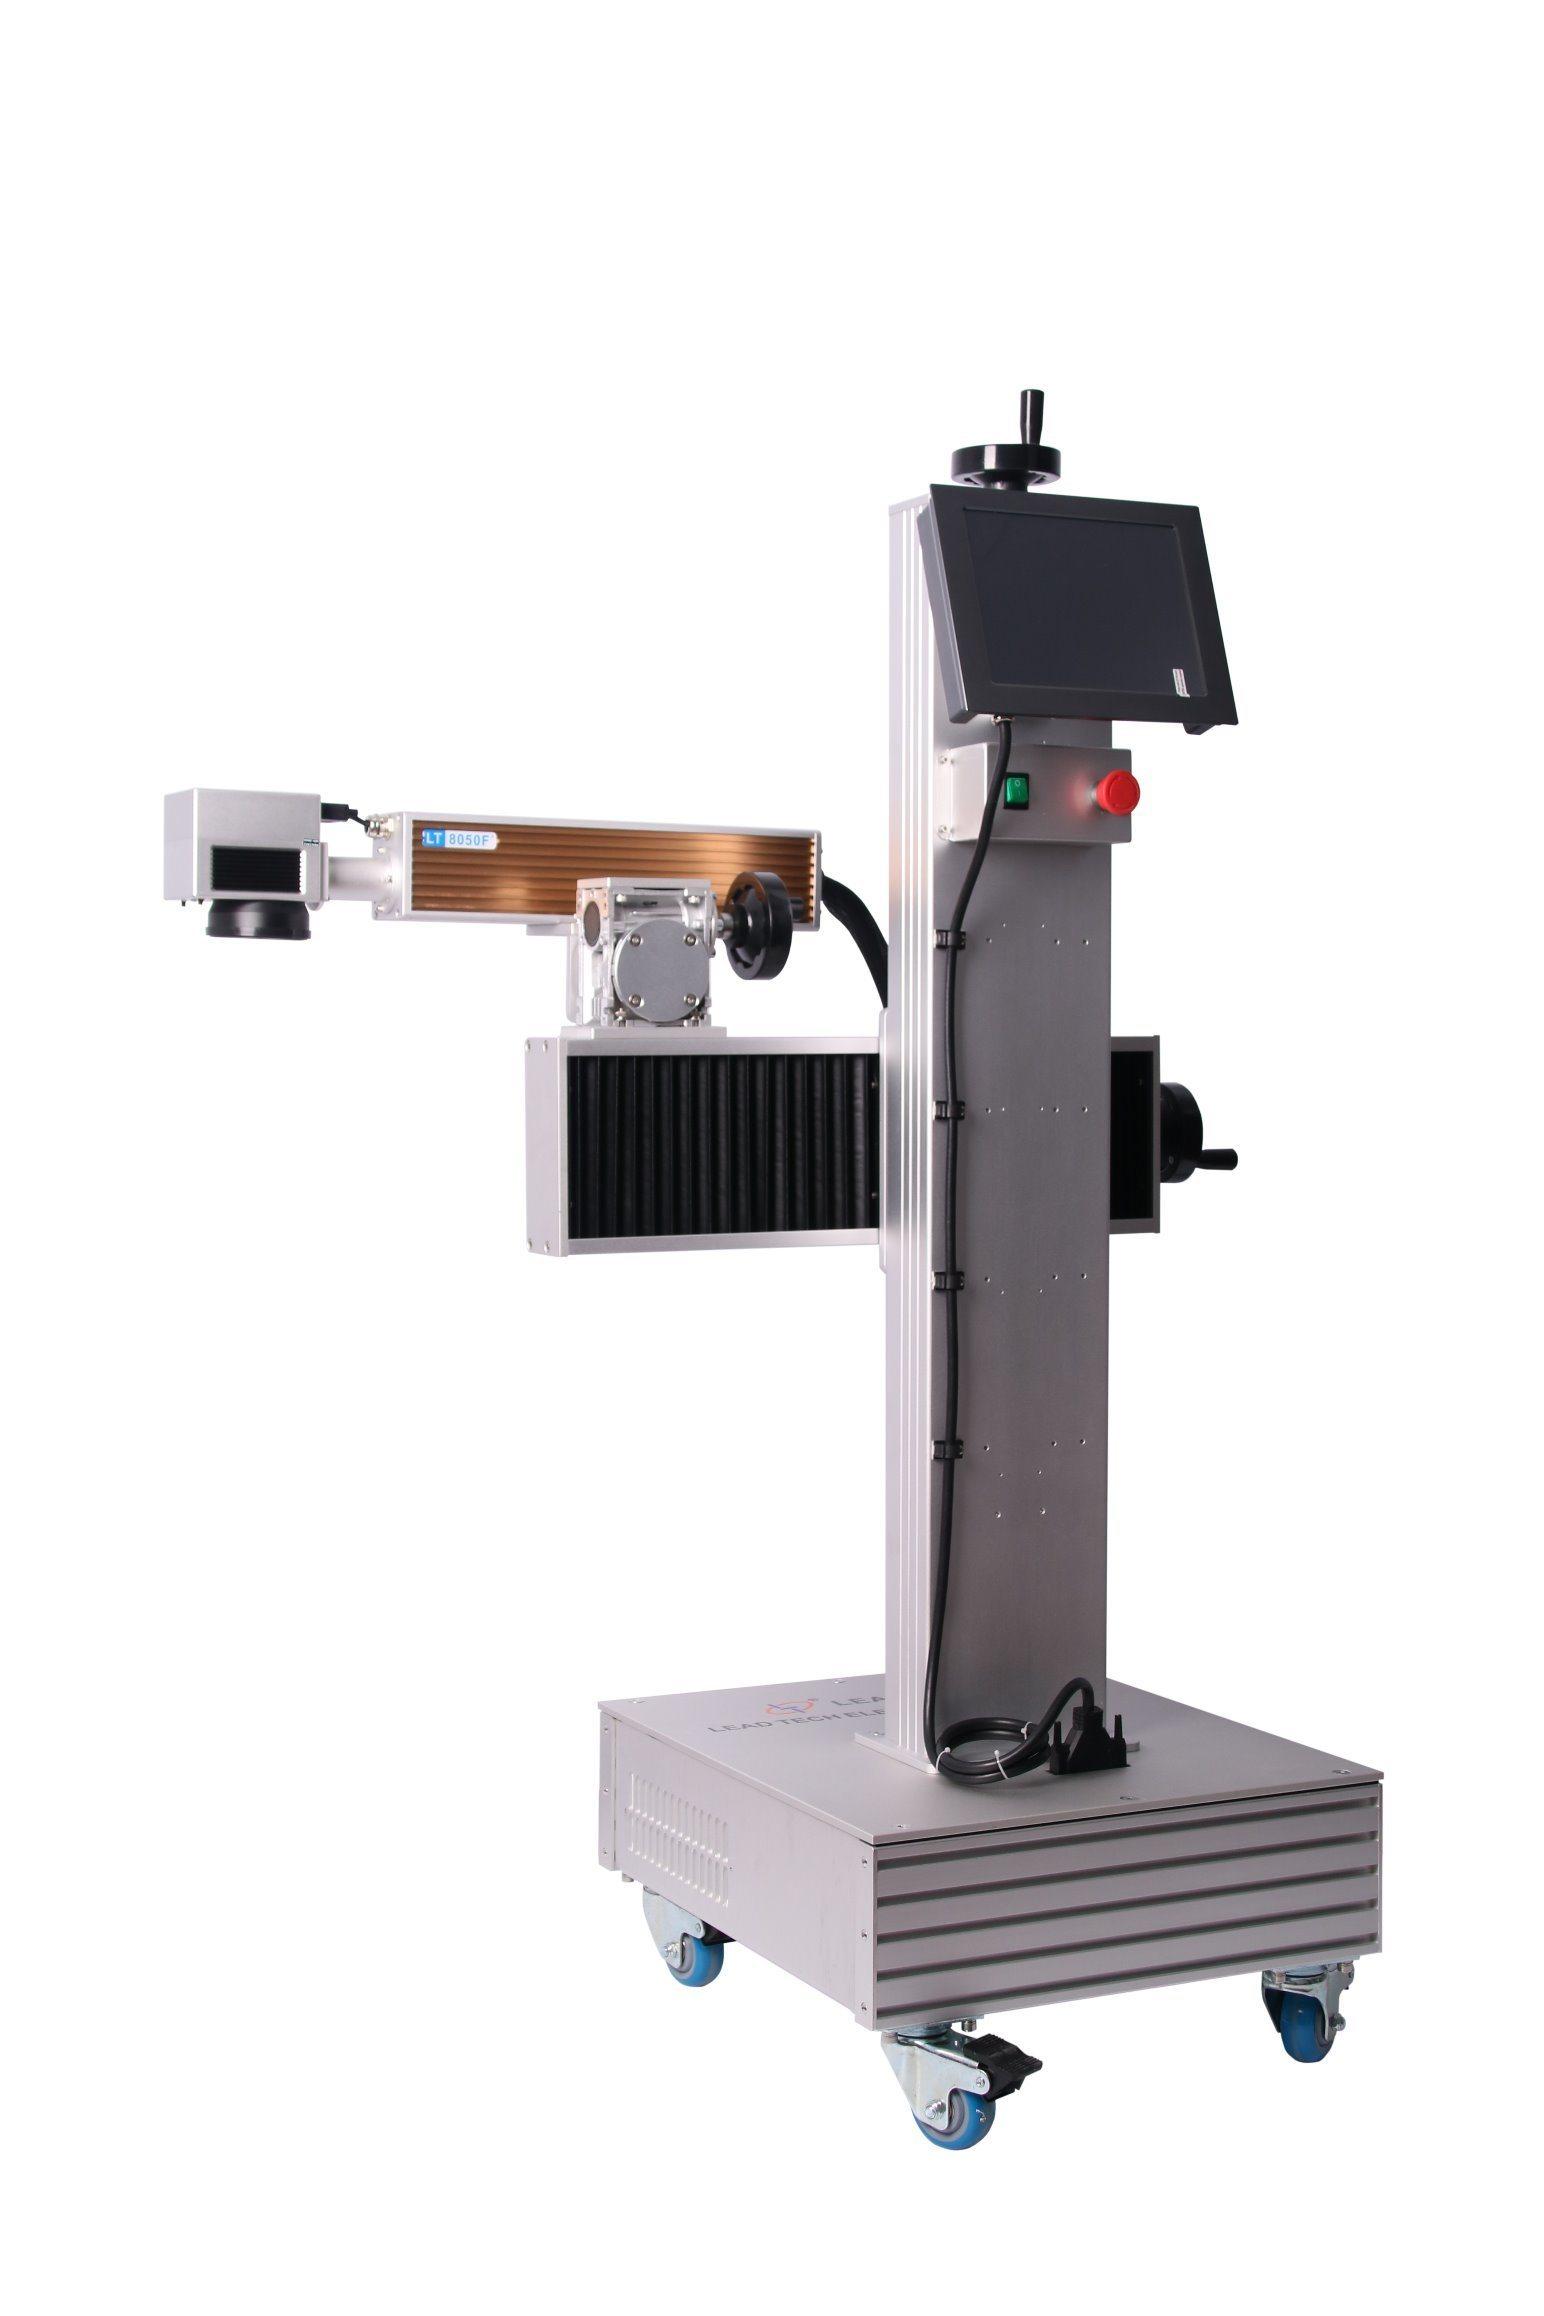 Lt8020f/Lt8030f/Lt8050f Fiber High Performance Economic PP Film Laser Marking Printer